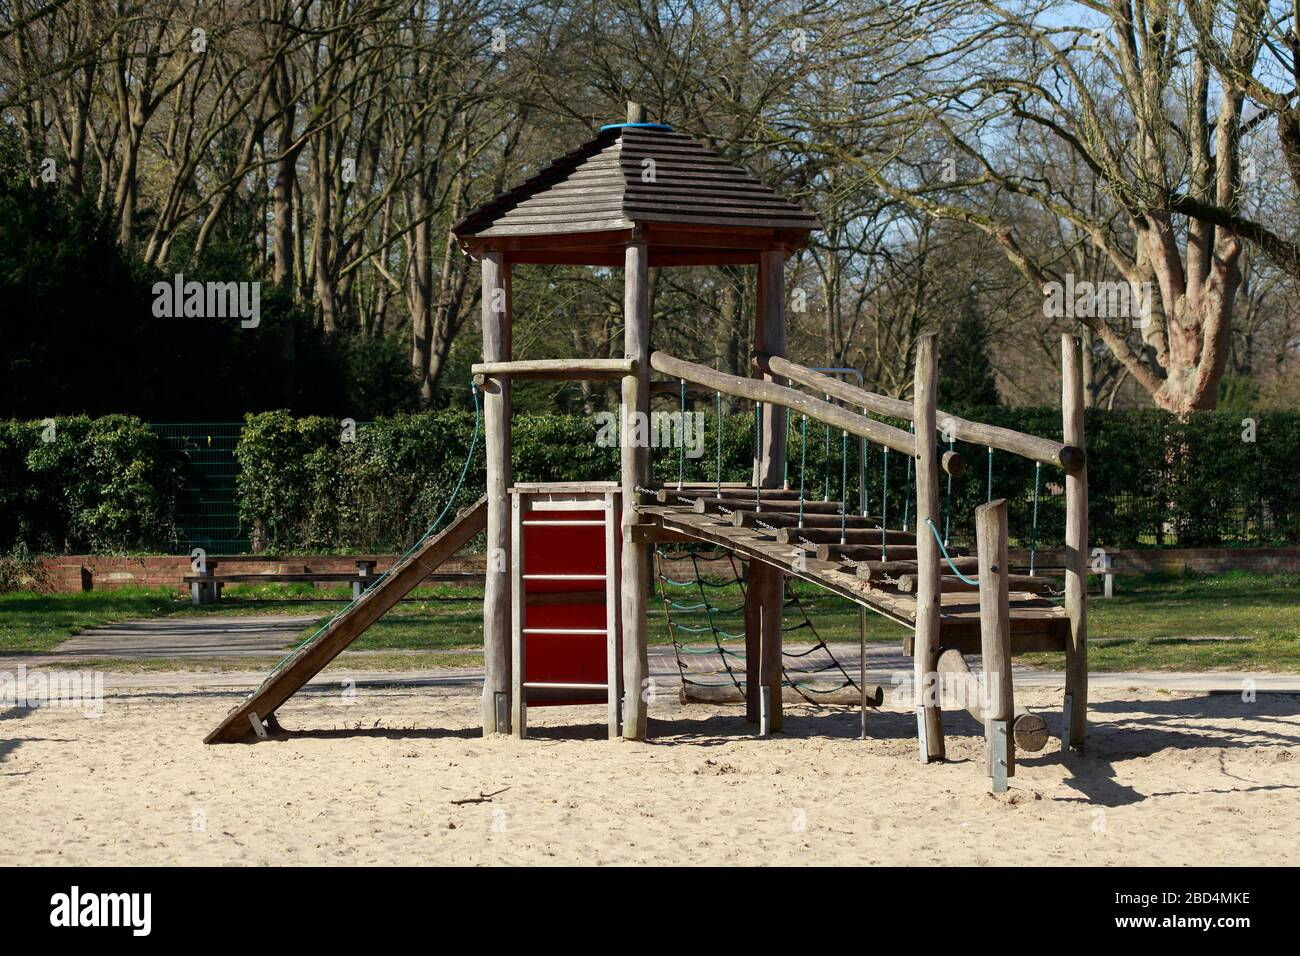 Empty playground, closed due to corona virus, forbidden to enter, Germany, Europe Stock Photo